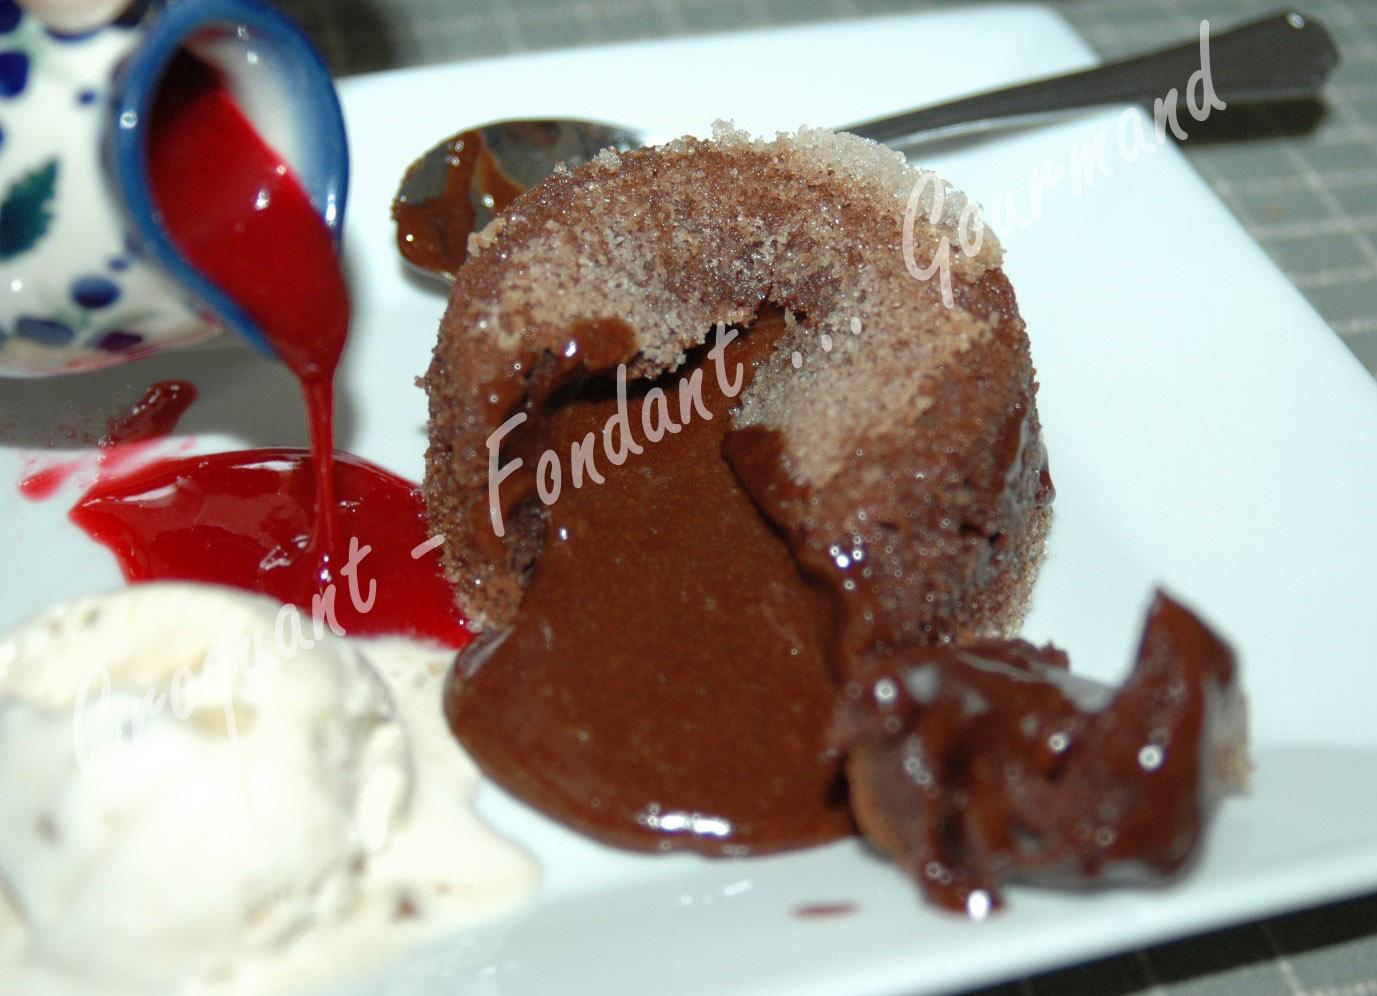 fondant au chocolat -DSC_7151_15544